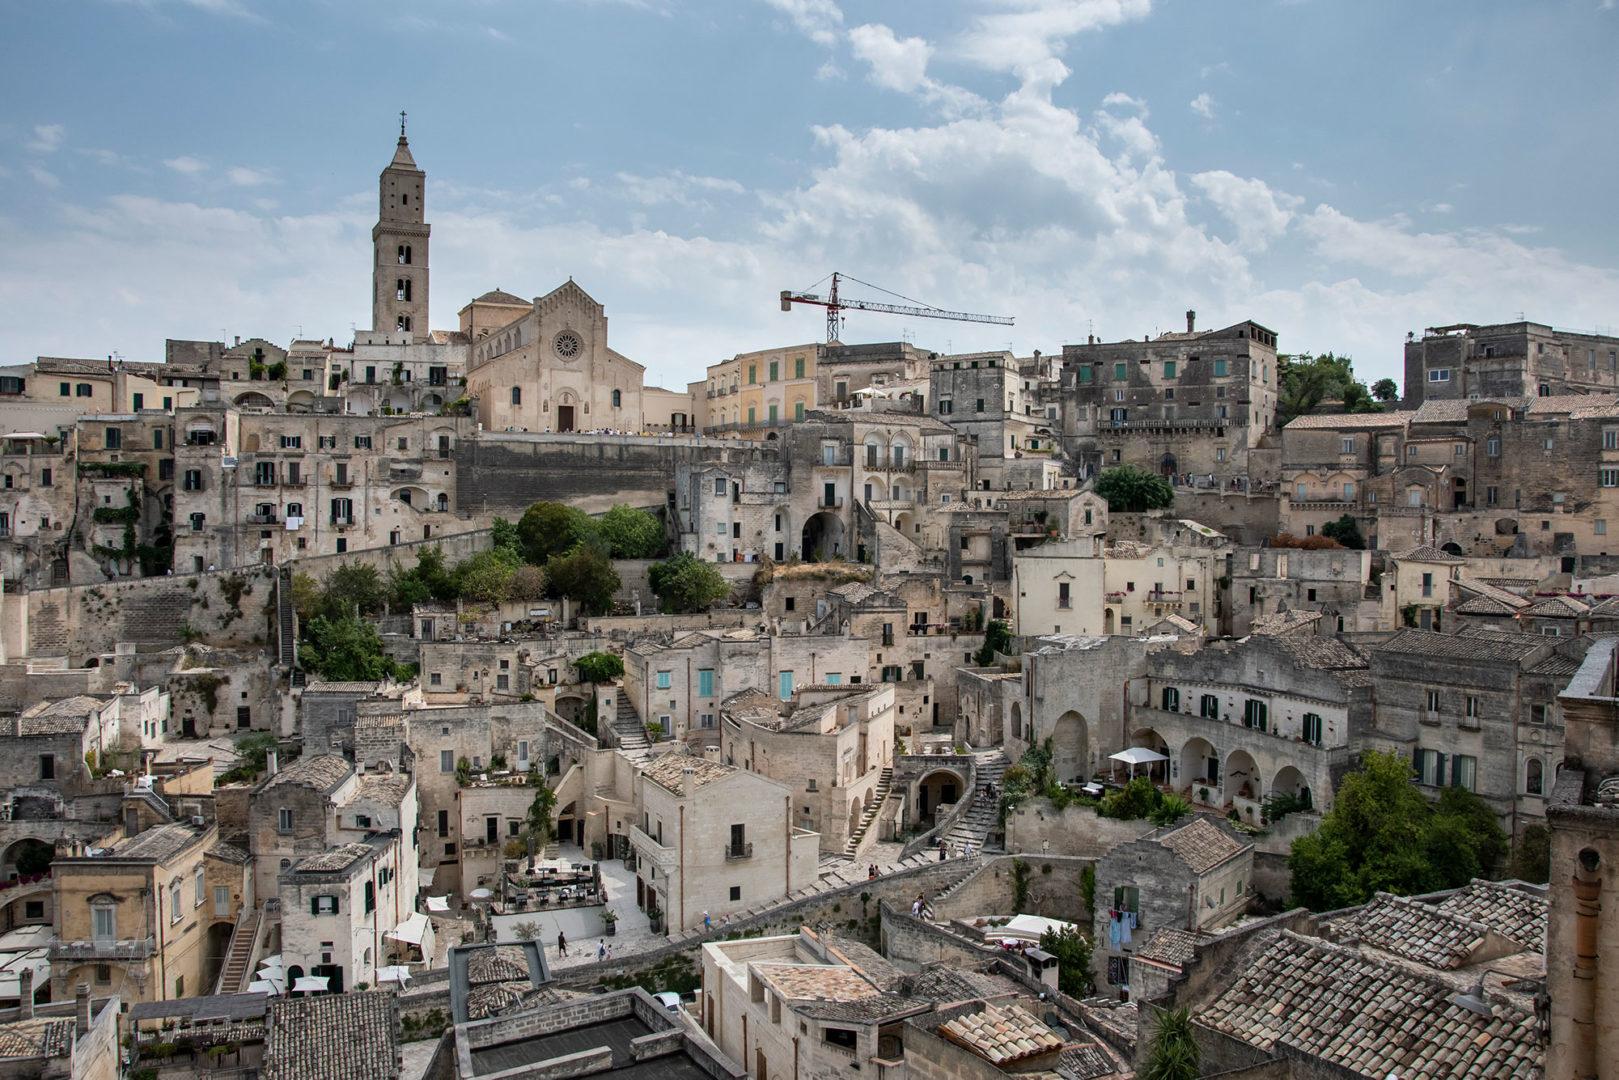 Panorama di Matera - Foto di Marco Sinico